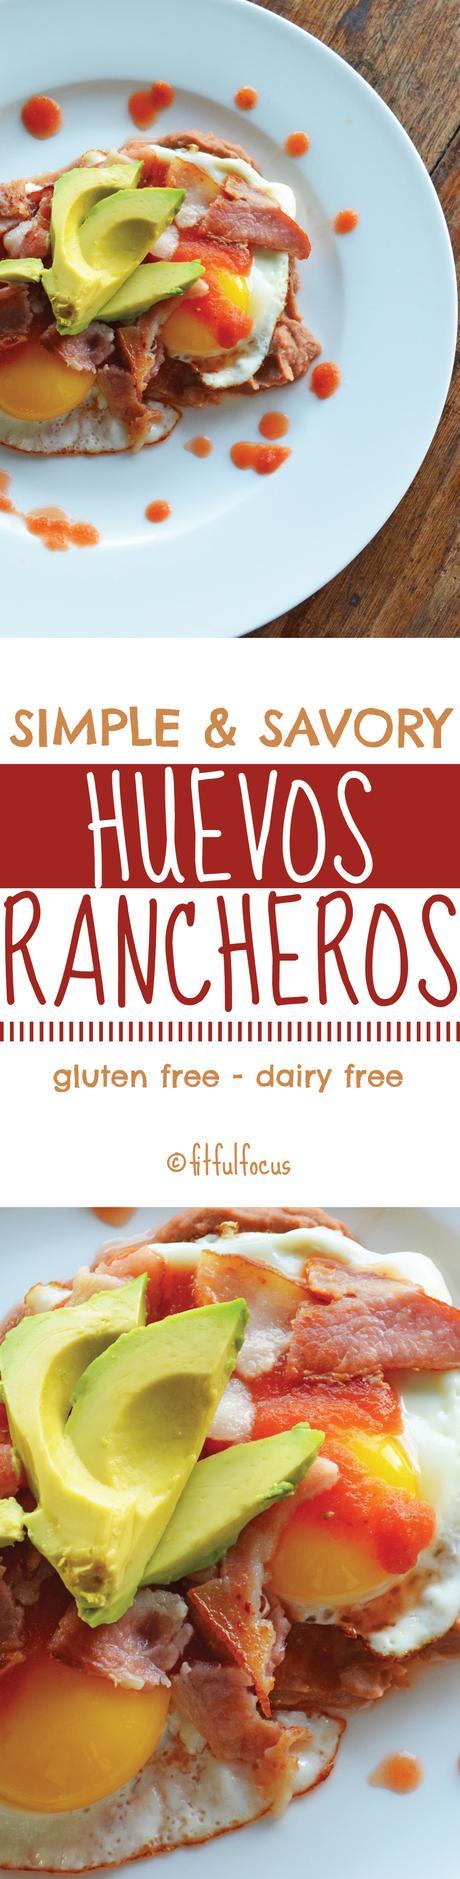 Simple and Savory Huevos Rancheros (gluten free, dairy free)